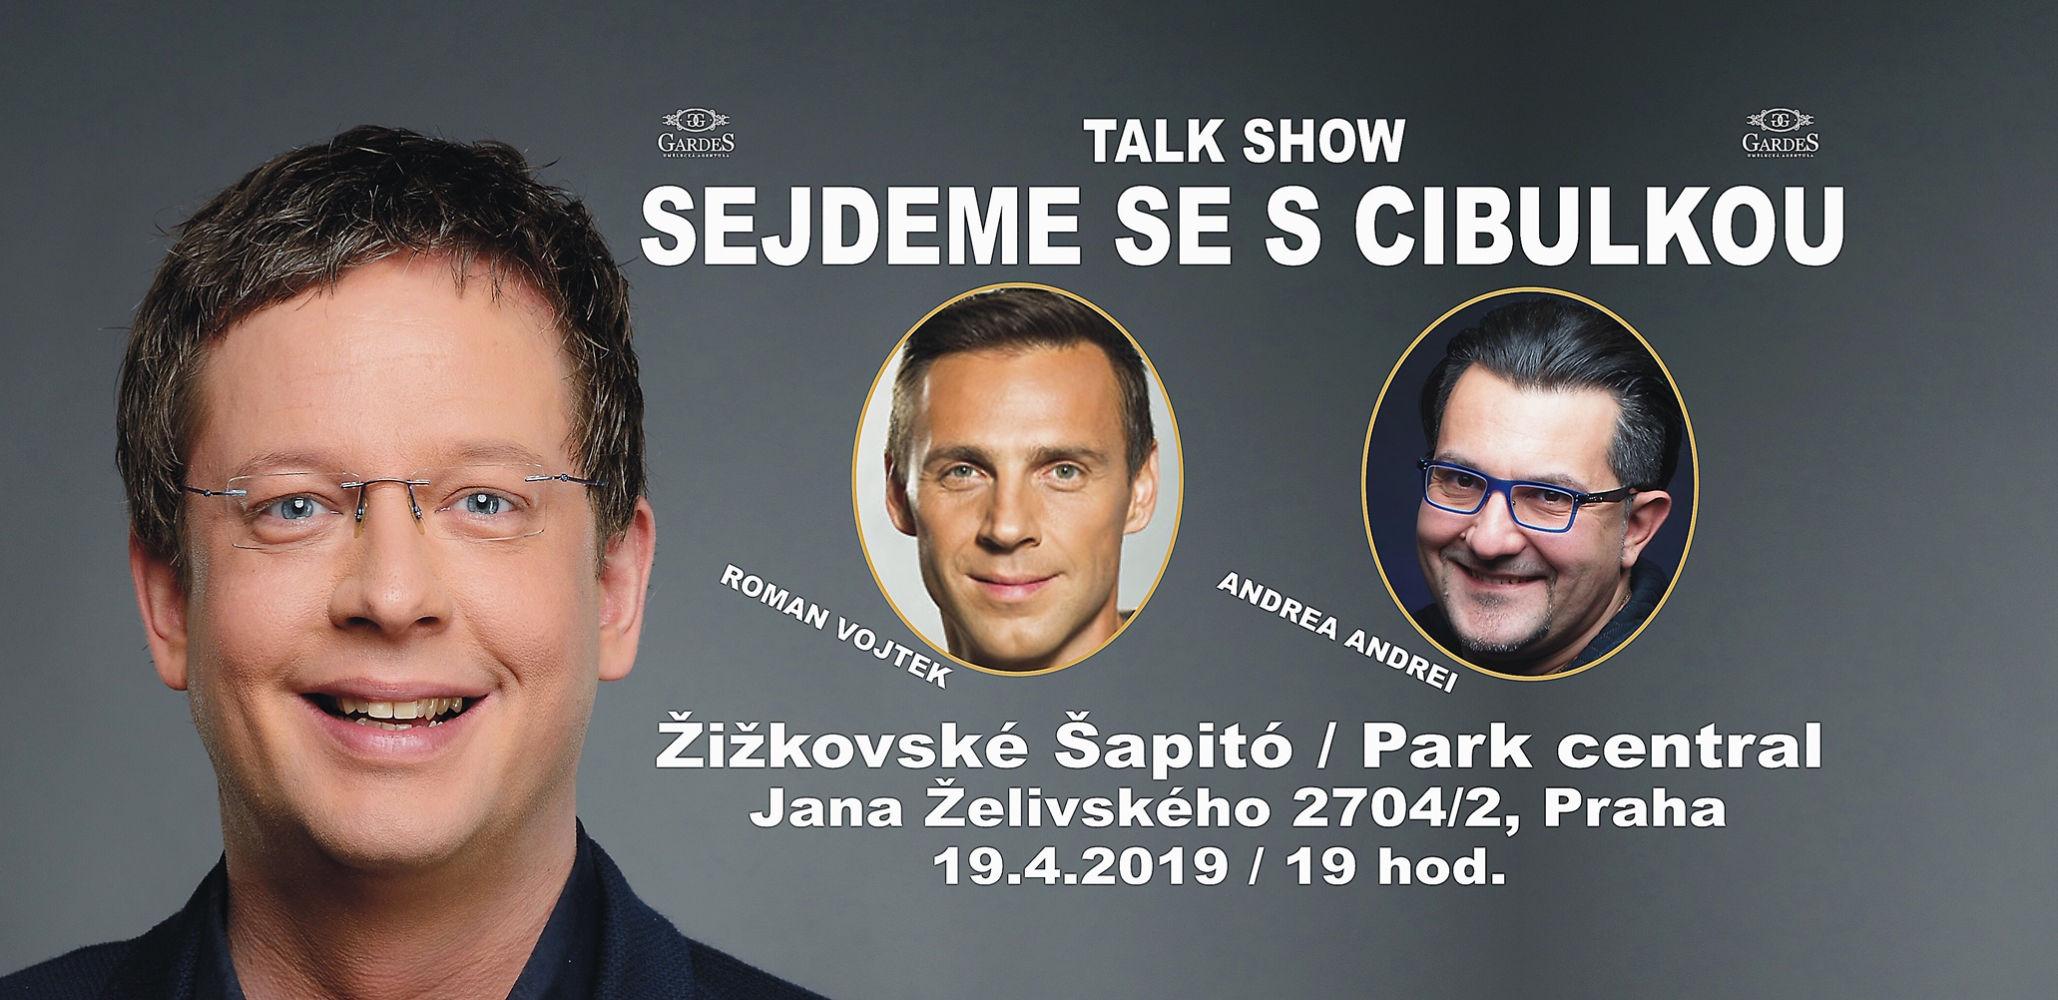 picture SEJDEME  SE S CIBULKOU, Žižkov